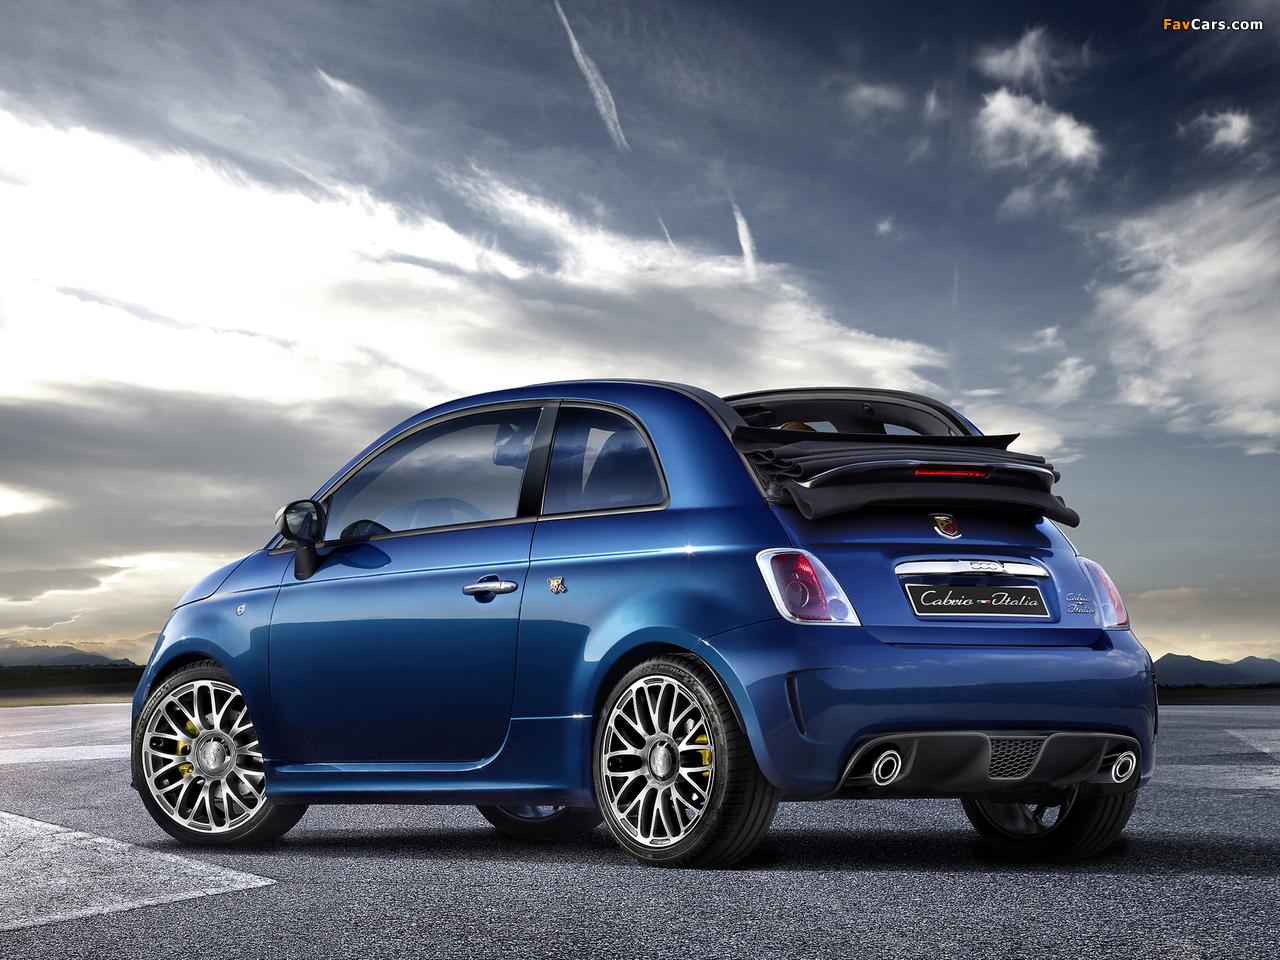 Abarth 500c Cabrio Italia 2011 Wallpapers 1280x960